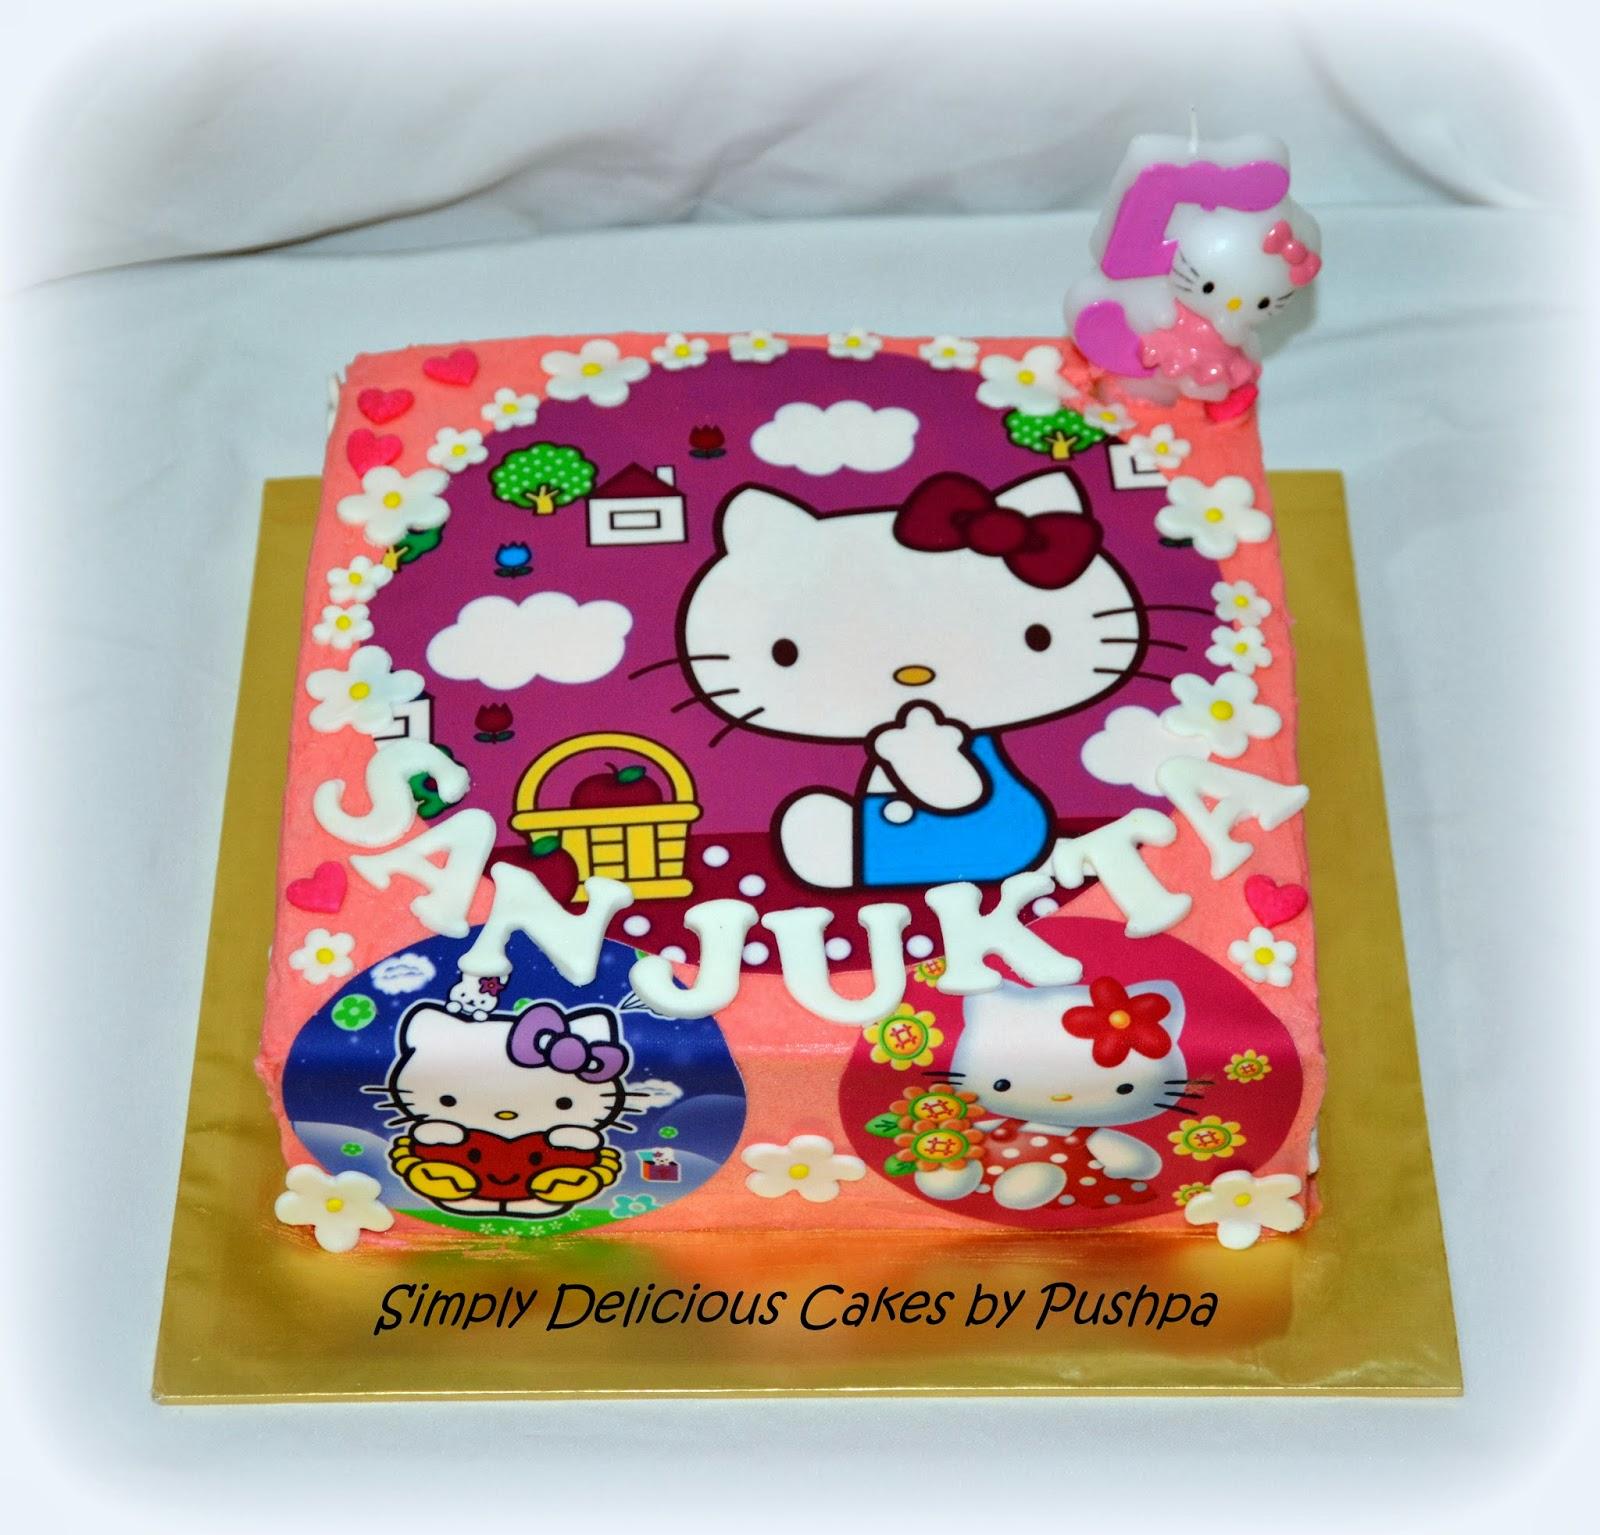 SIMPLY DELICIOUS CAKES: Hello Kitty Cake